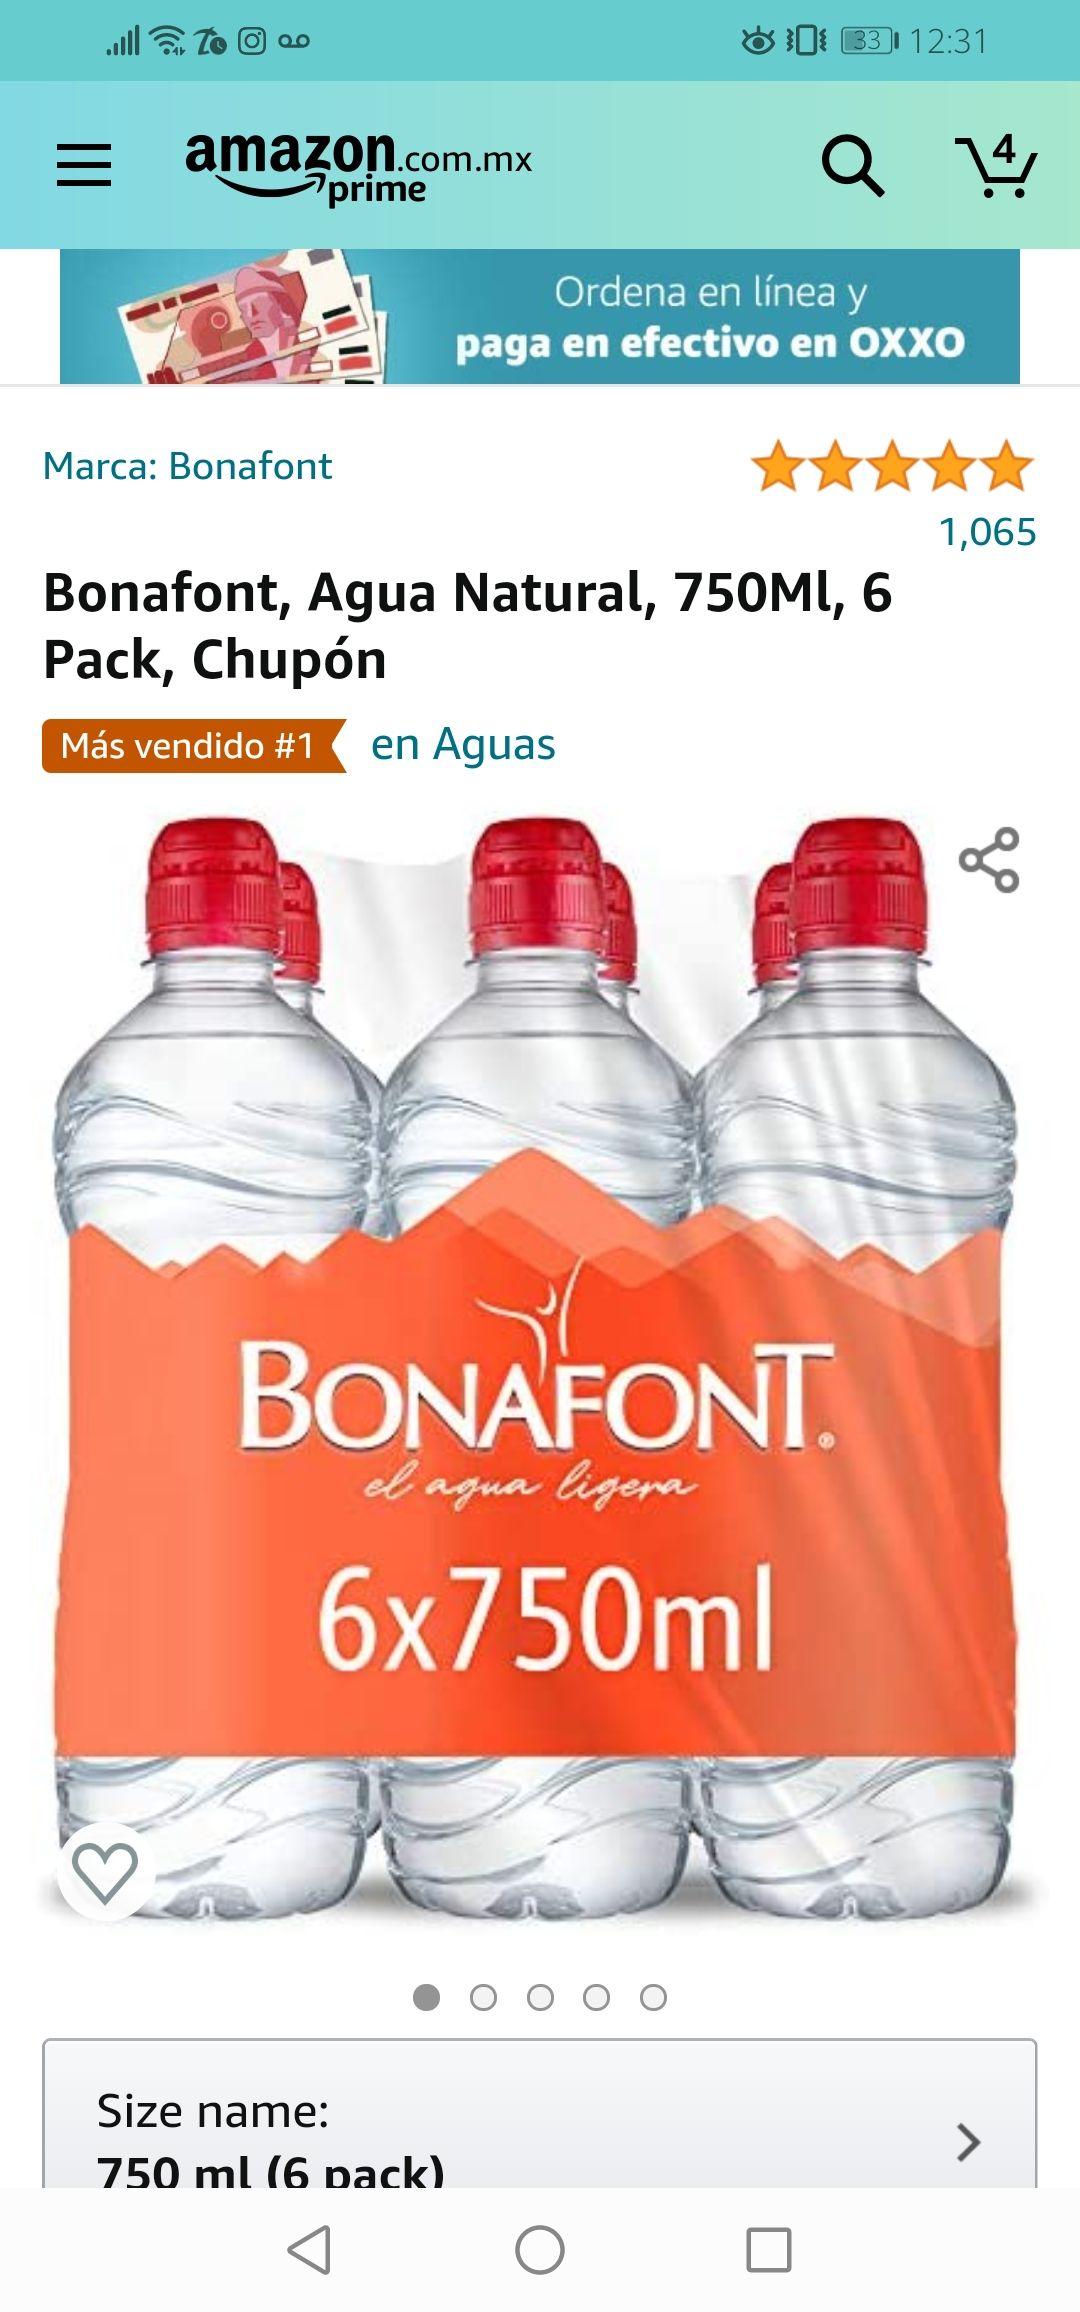 Amazon: Bonafont, Agua Natural, 750Ml, 6 Pack, Chupón